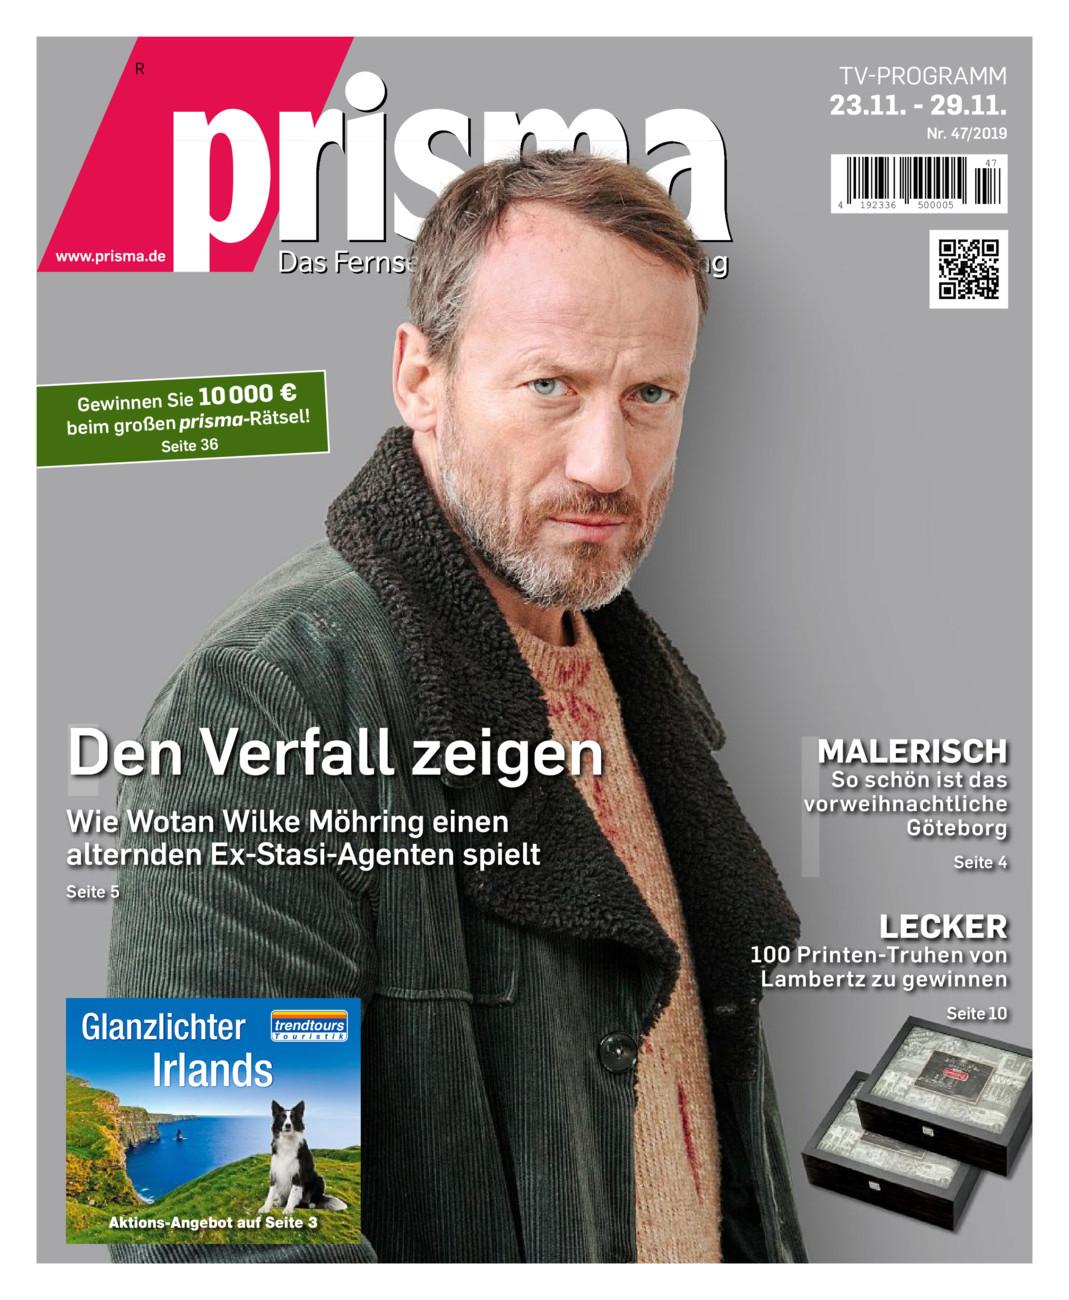 Prisma 23.11. - 29.11.